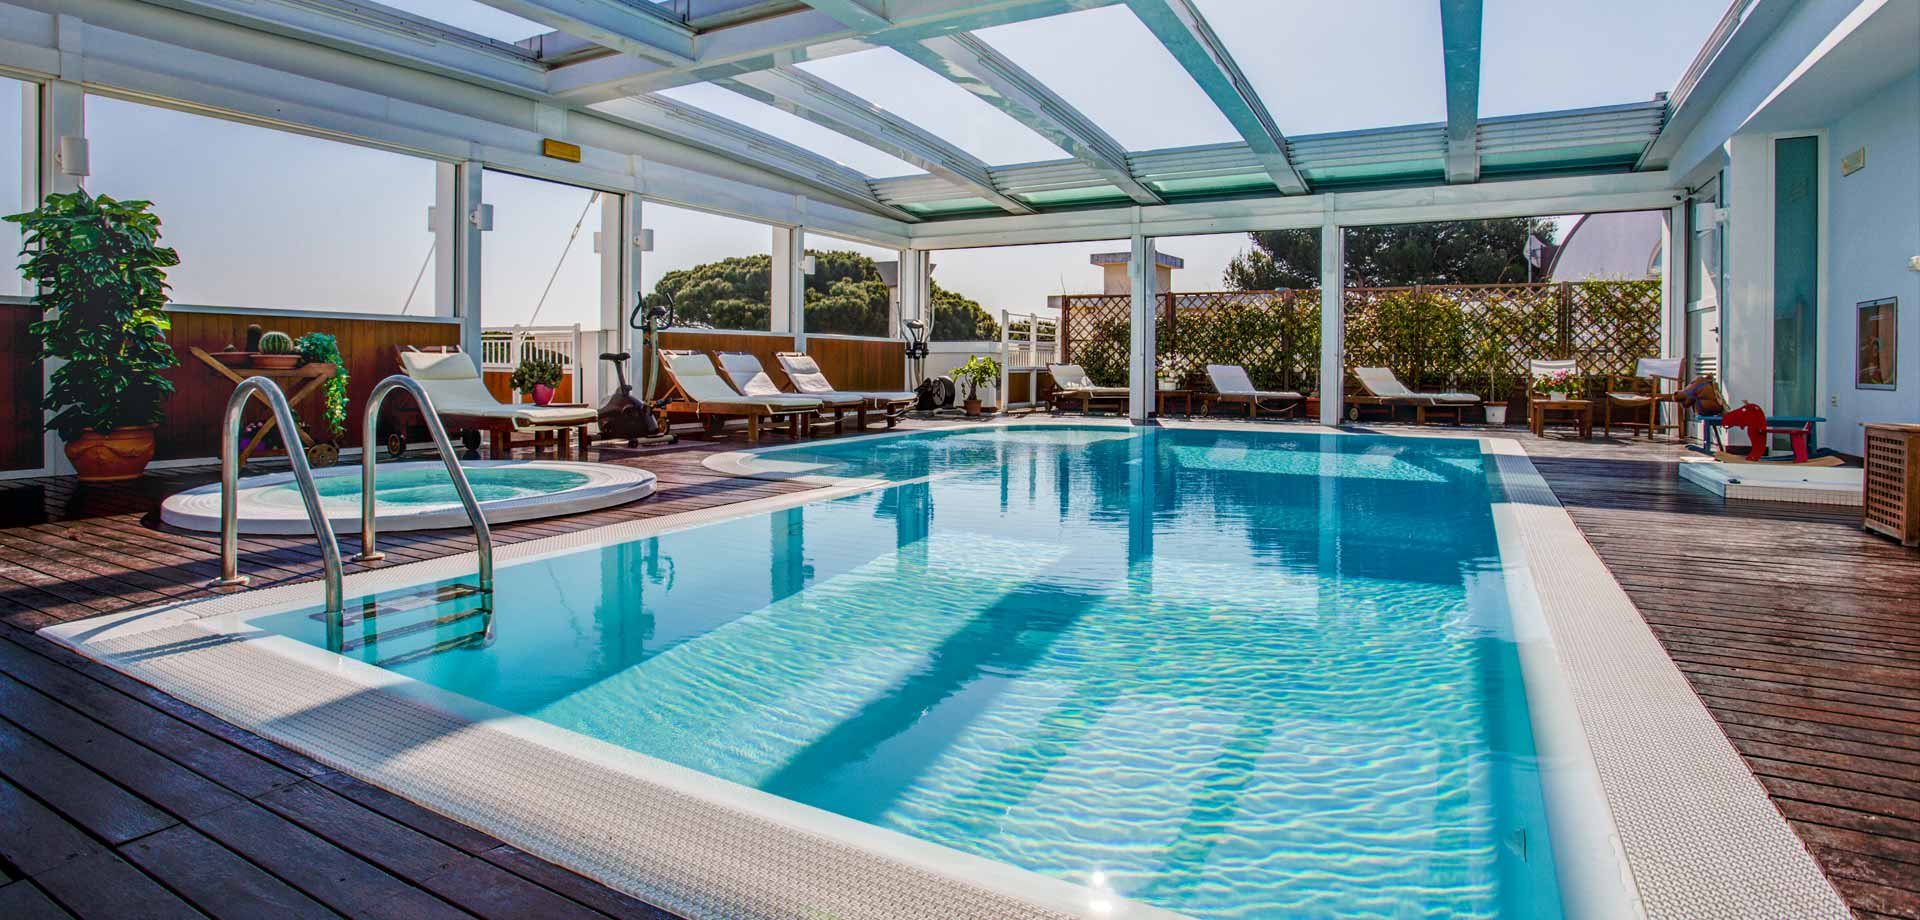 Piscina panoramica aparthotel england - Hotel a pejo con piscina ...